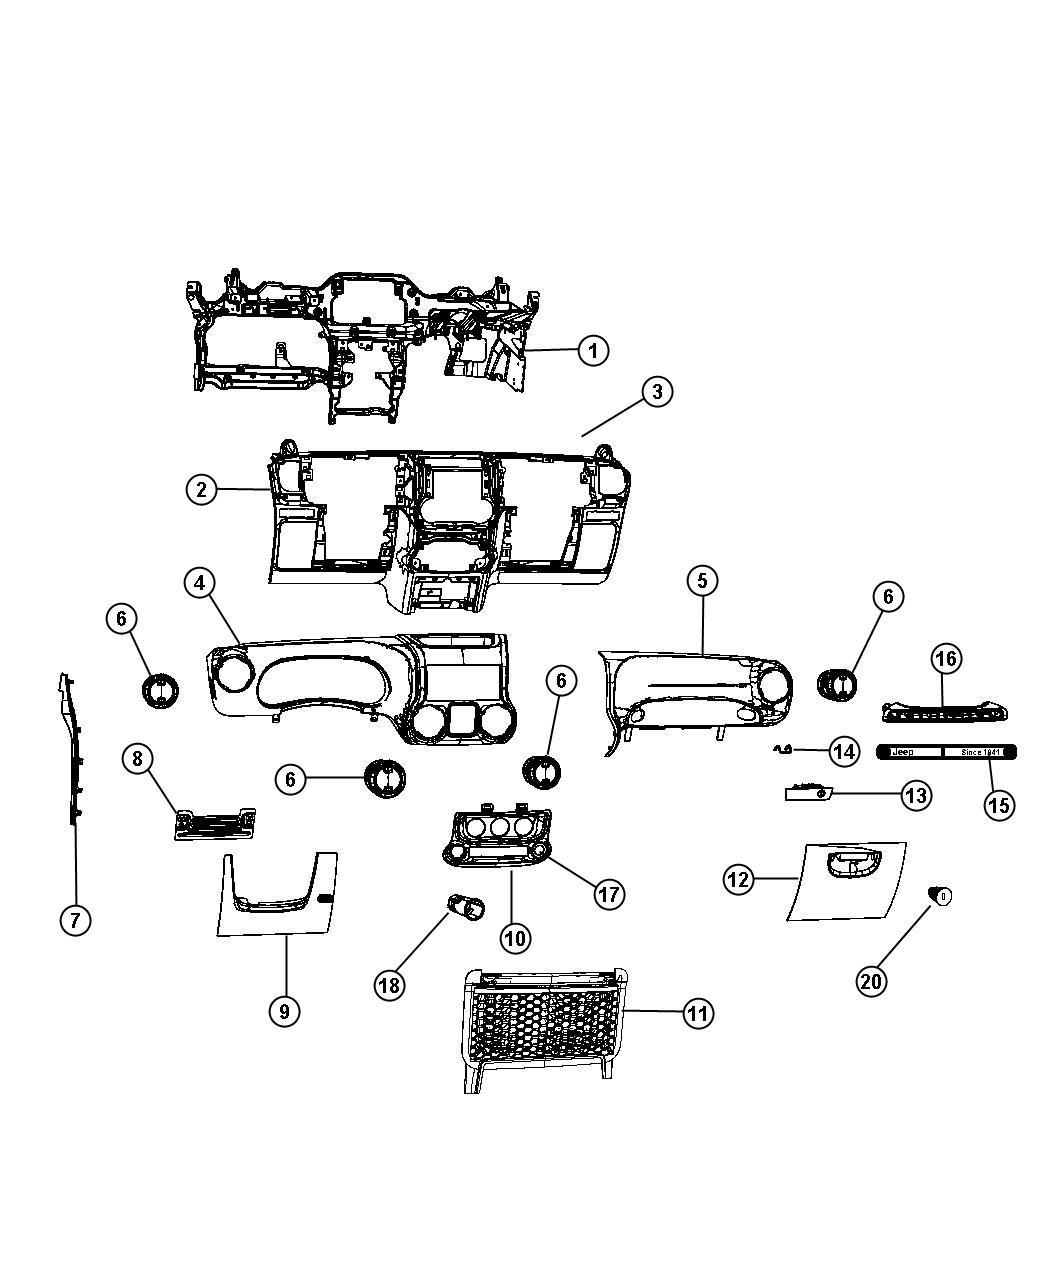 2011 Jeep Wrangler Seal. Weatherstrip. Trim: [all trim